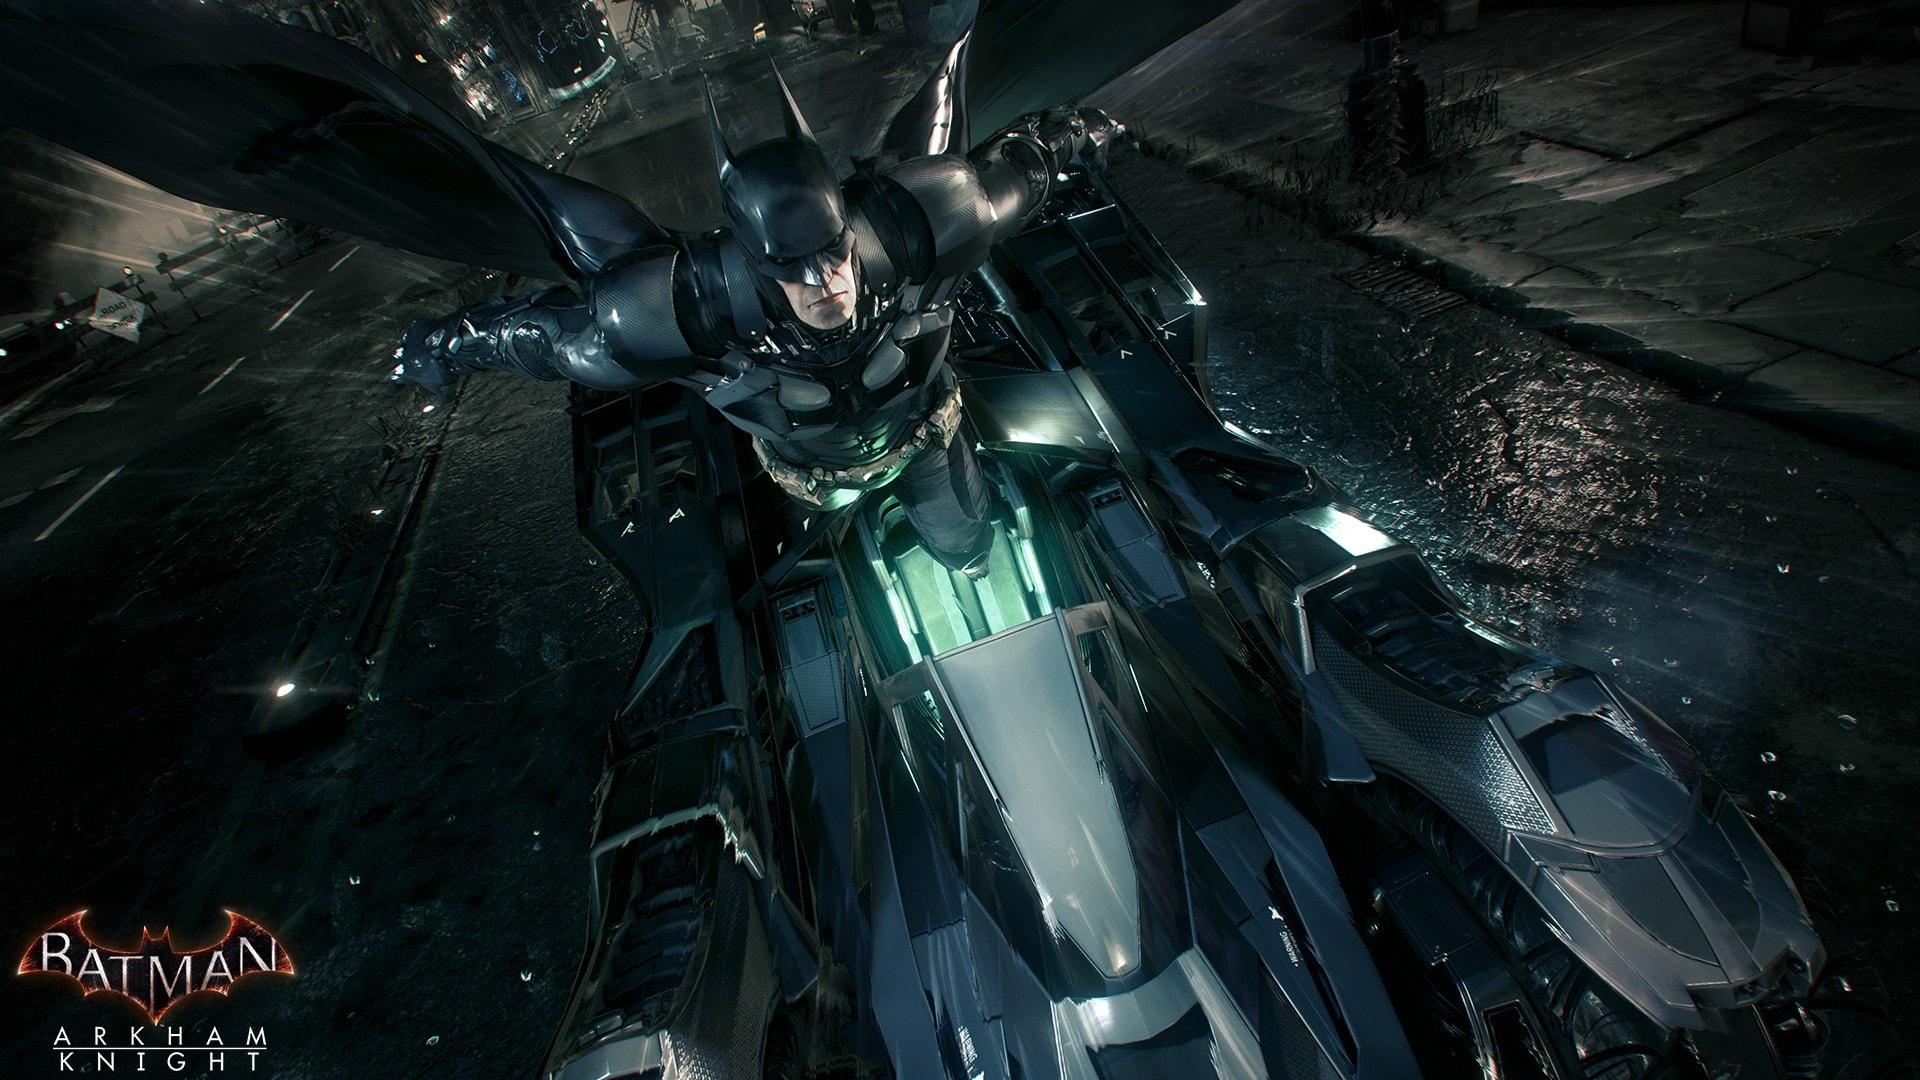 Batman Arkham Knight Batmobile Wallpaper by Jarminx on DeviantArt